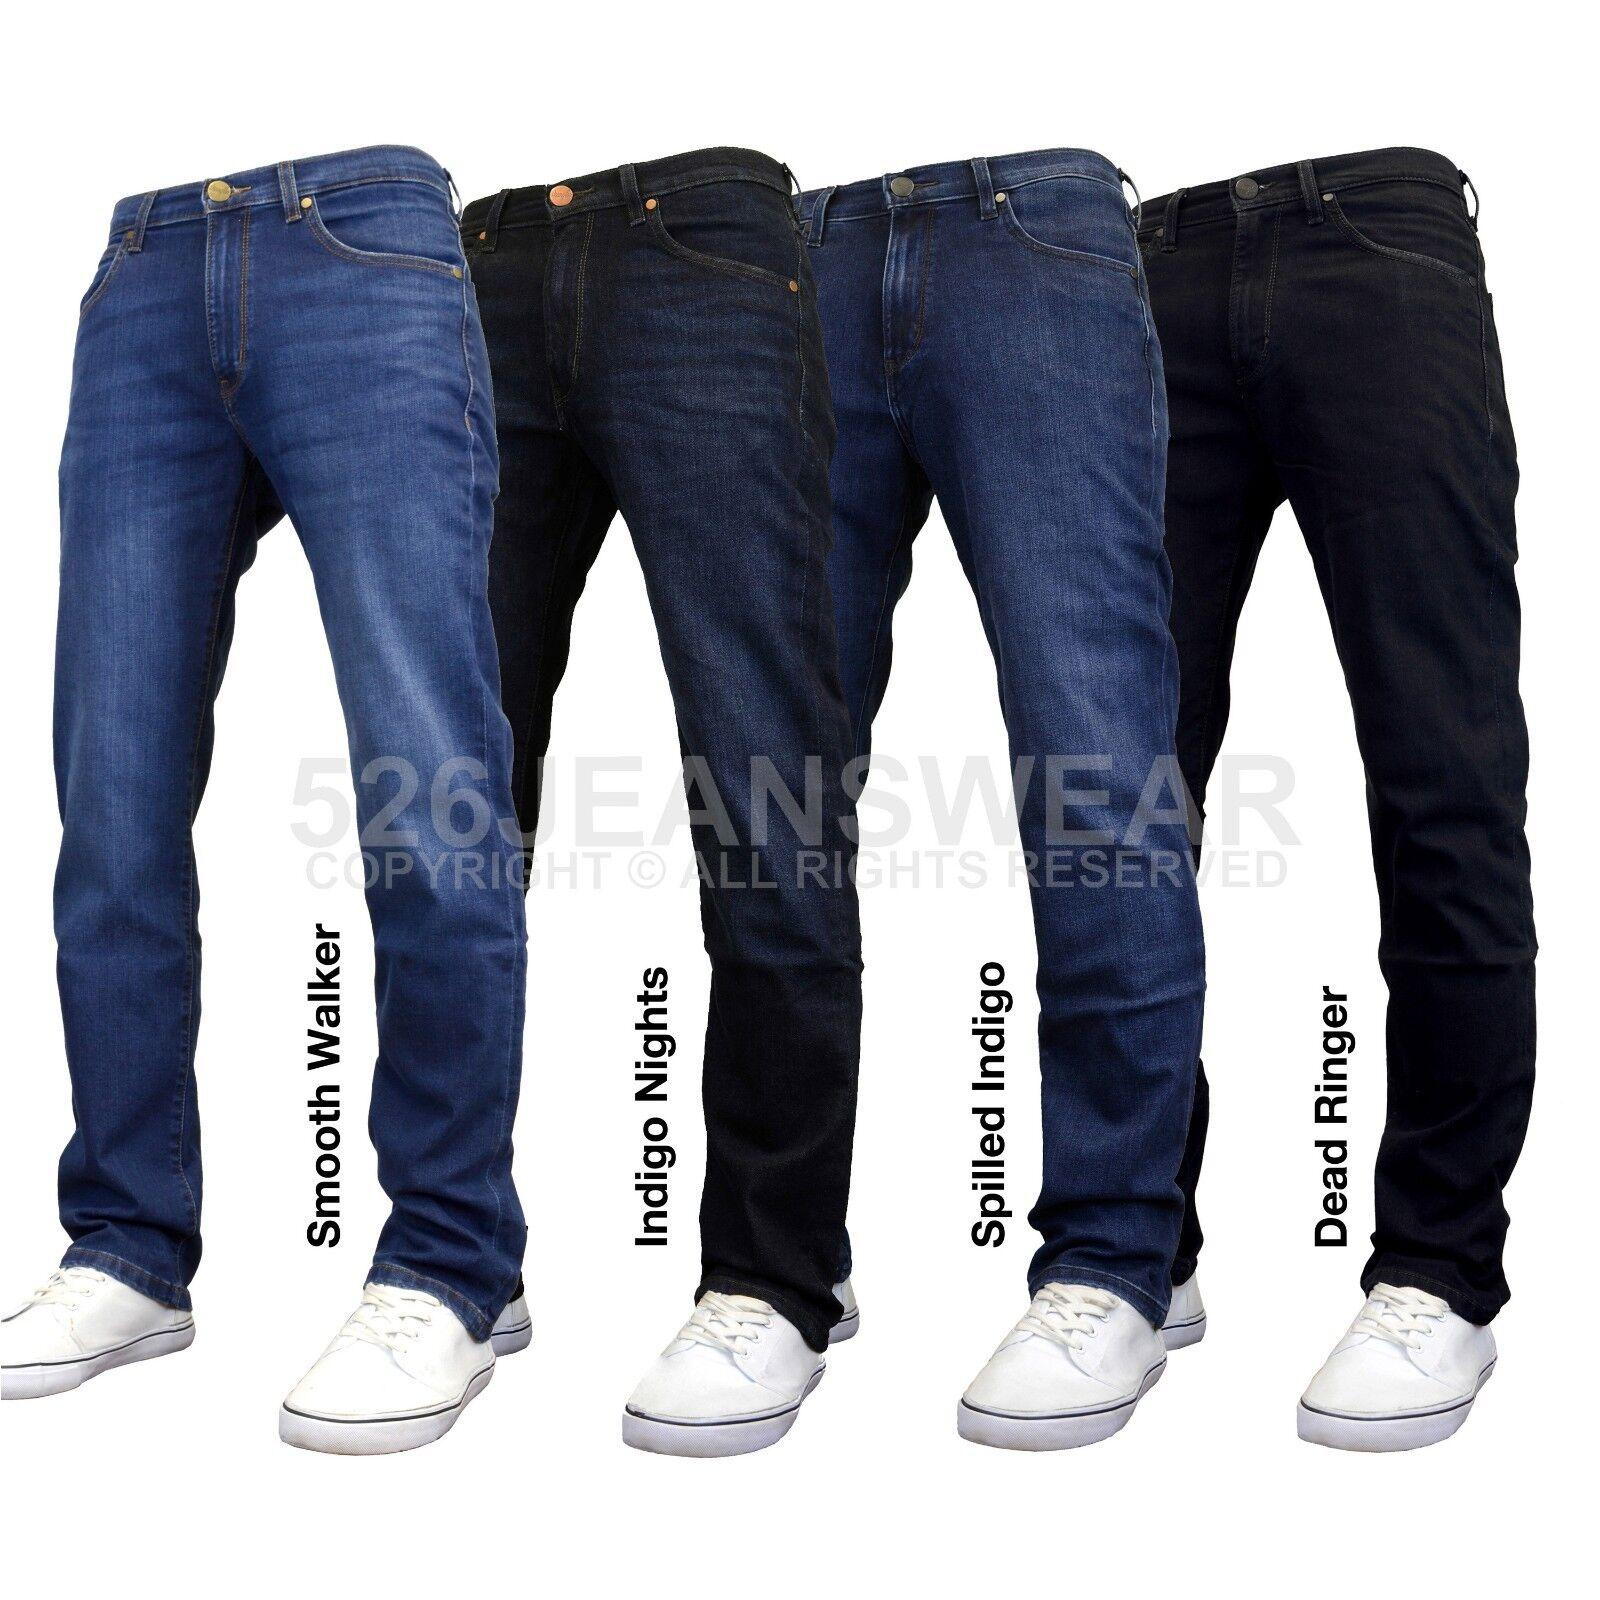 Wrangler Men's Arizona Stretch Regular Fit Straight Leg Jeans, BNWT